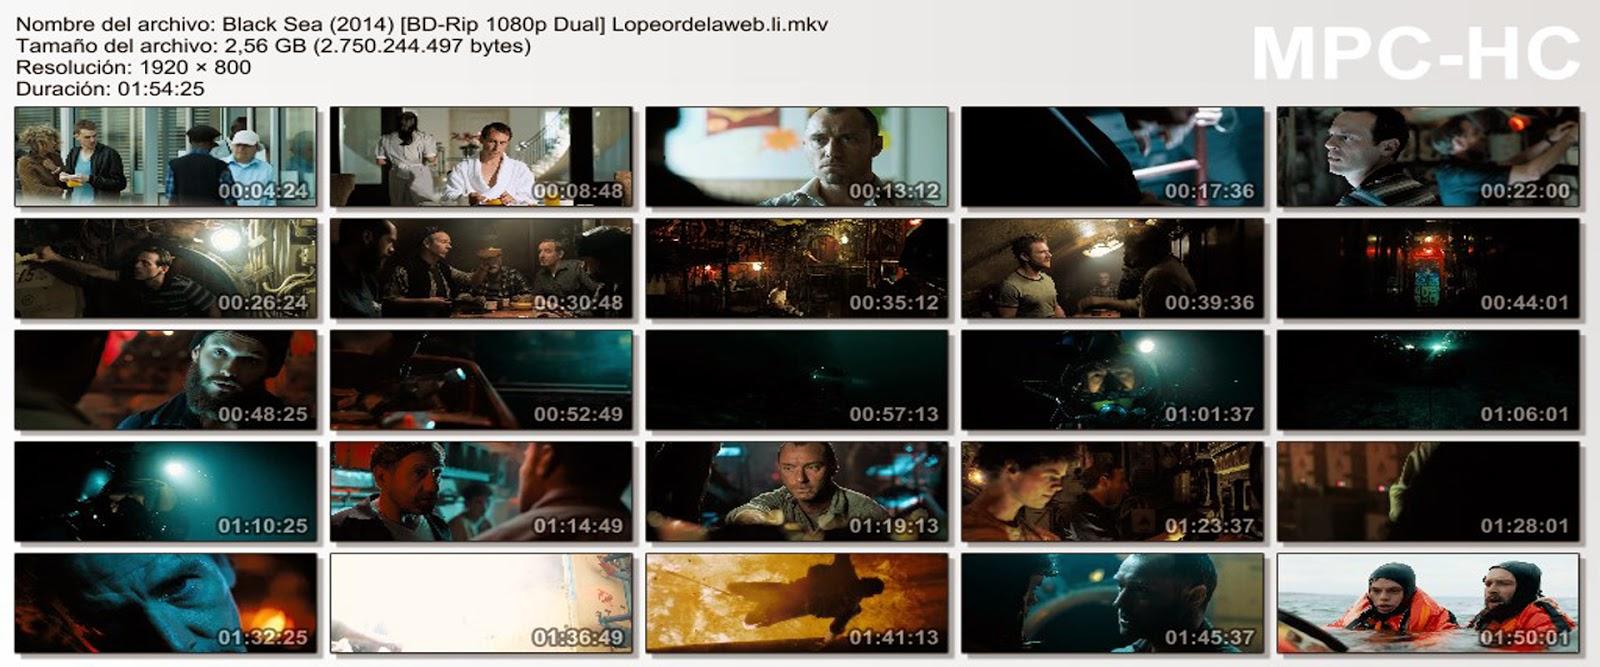 Black Sea (2014) [1080p. Dual]